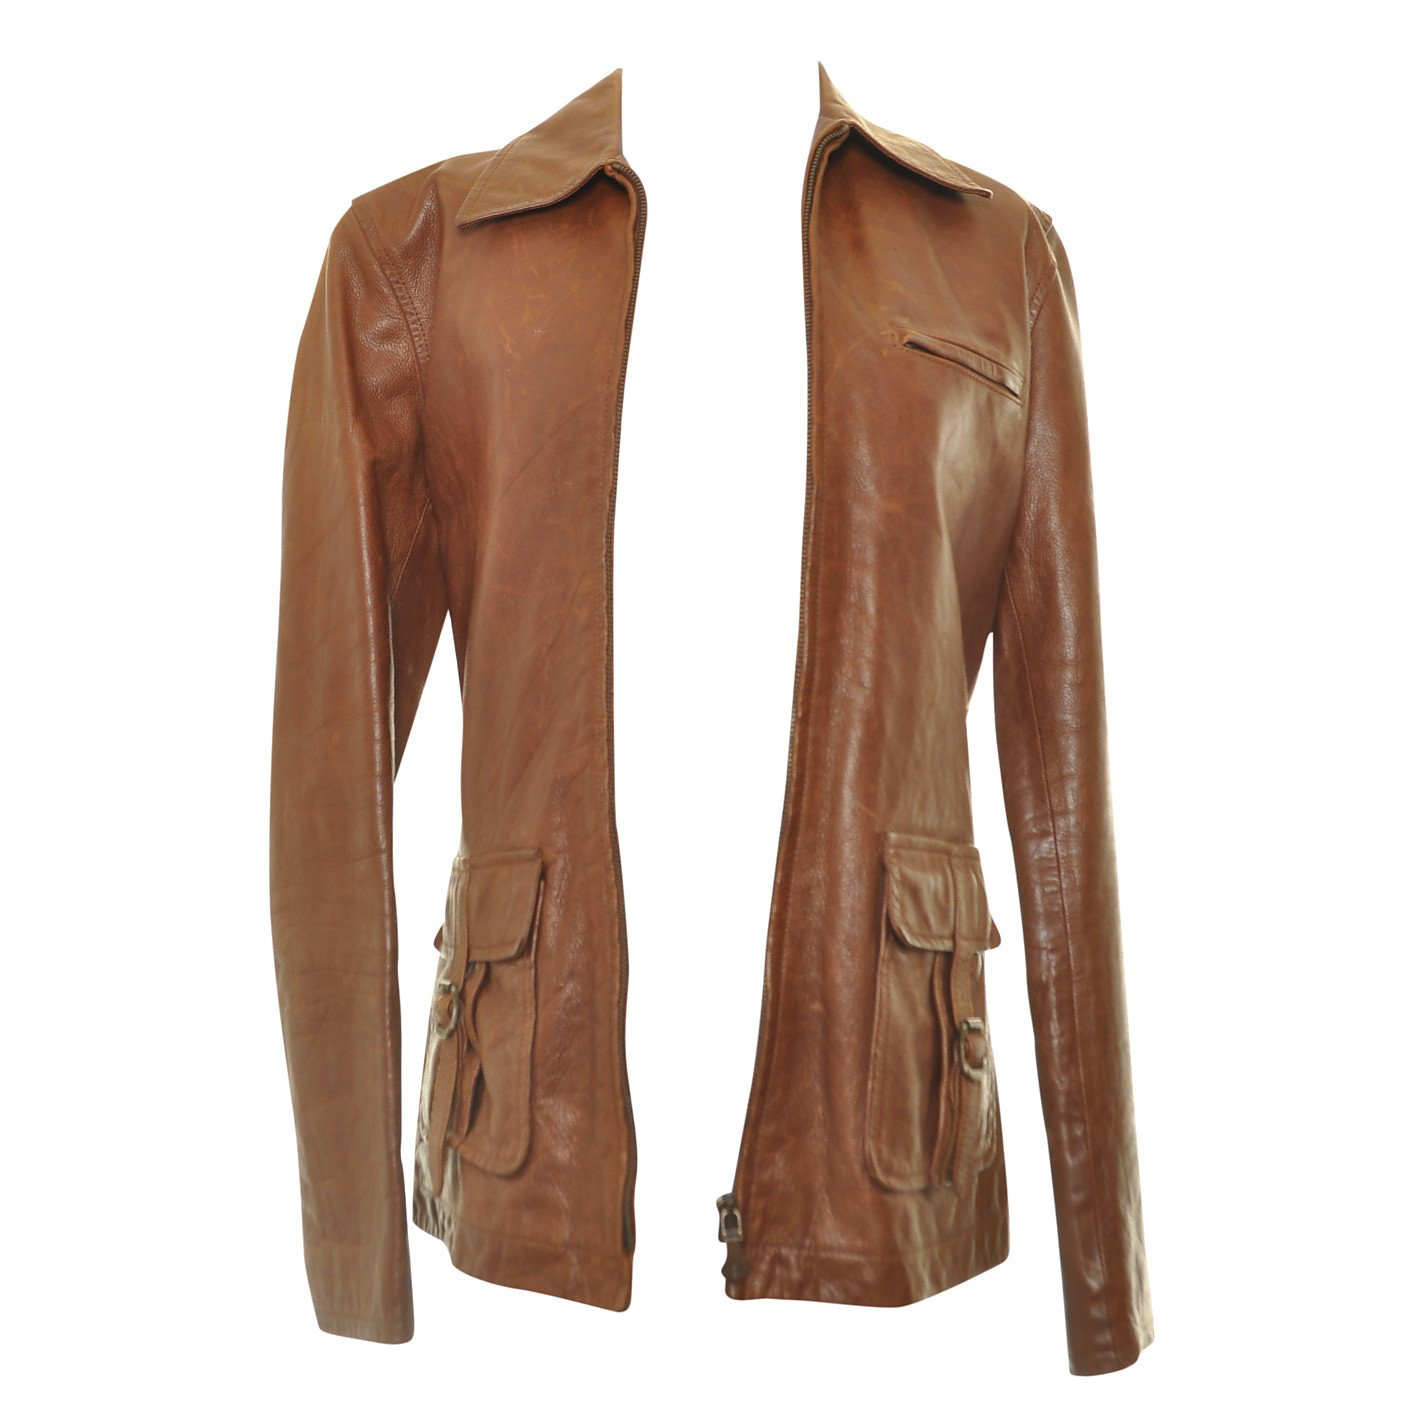 Ralph Lauren Buckle-Detail Leather Jacket